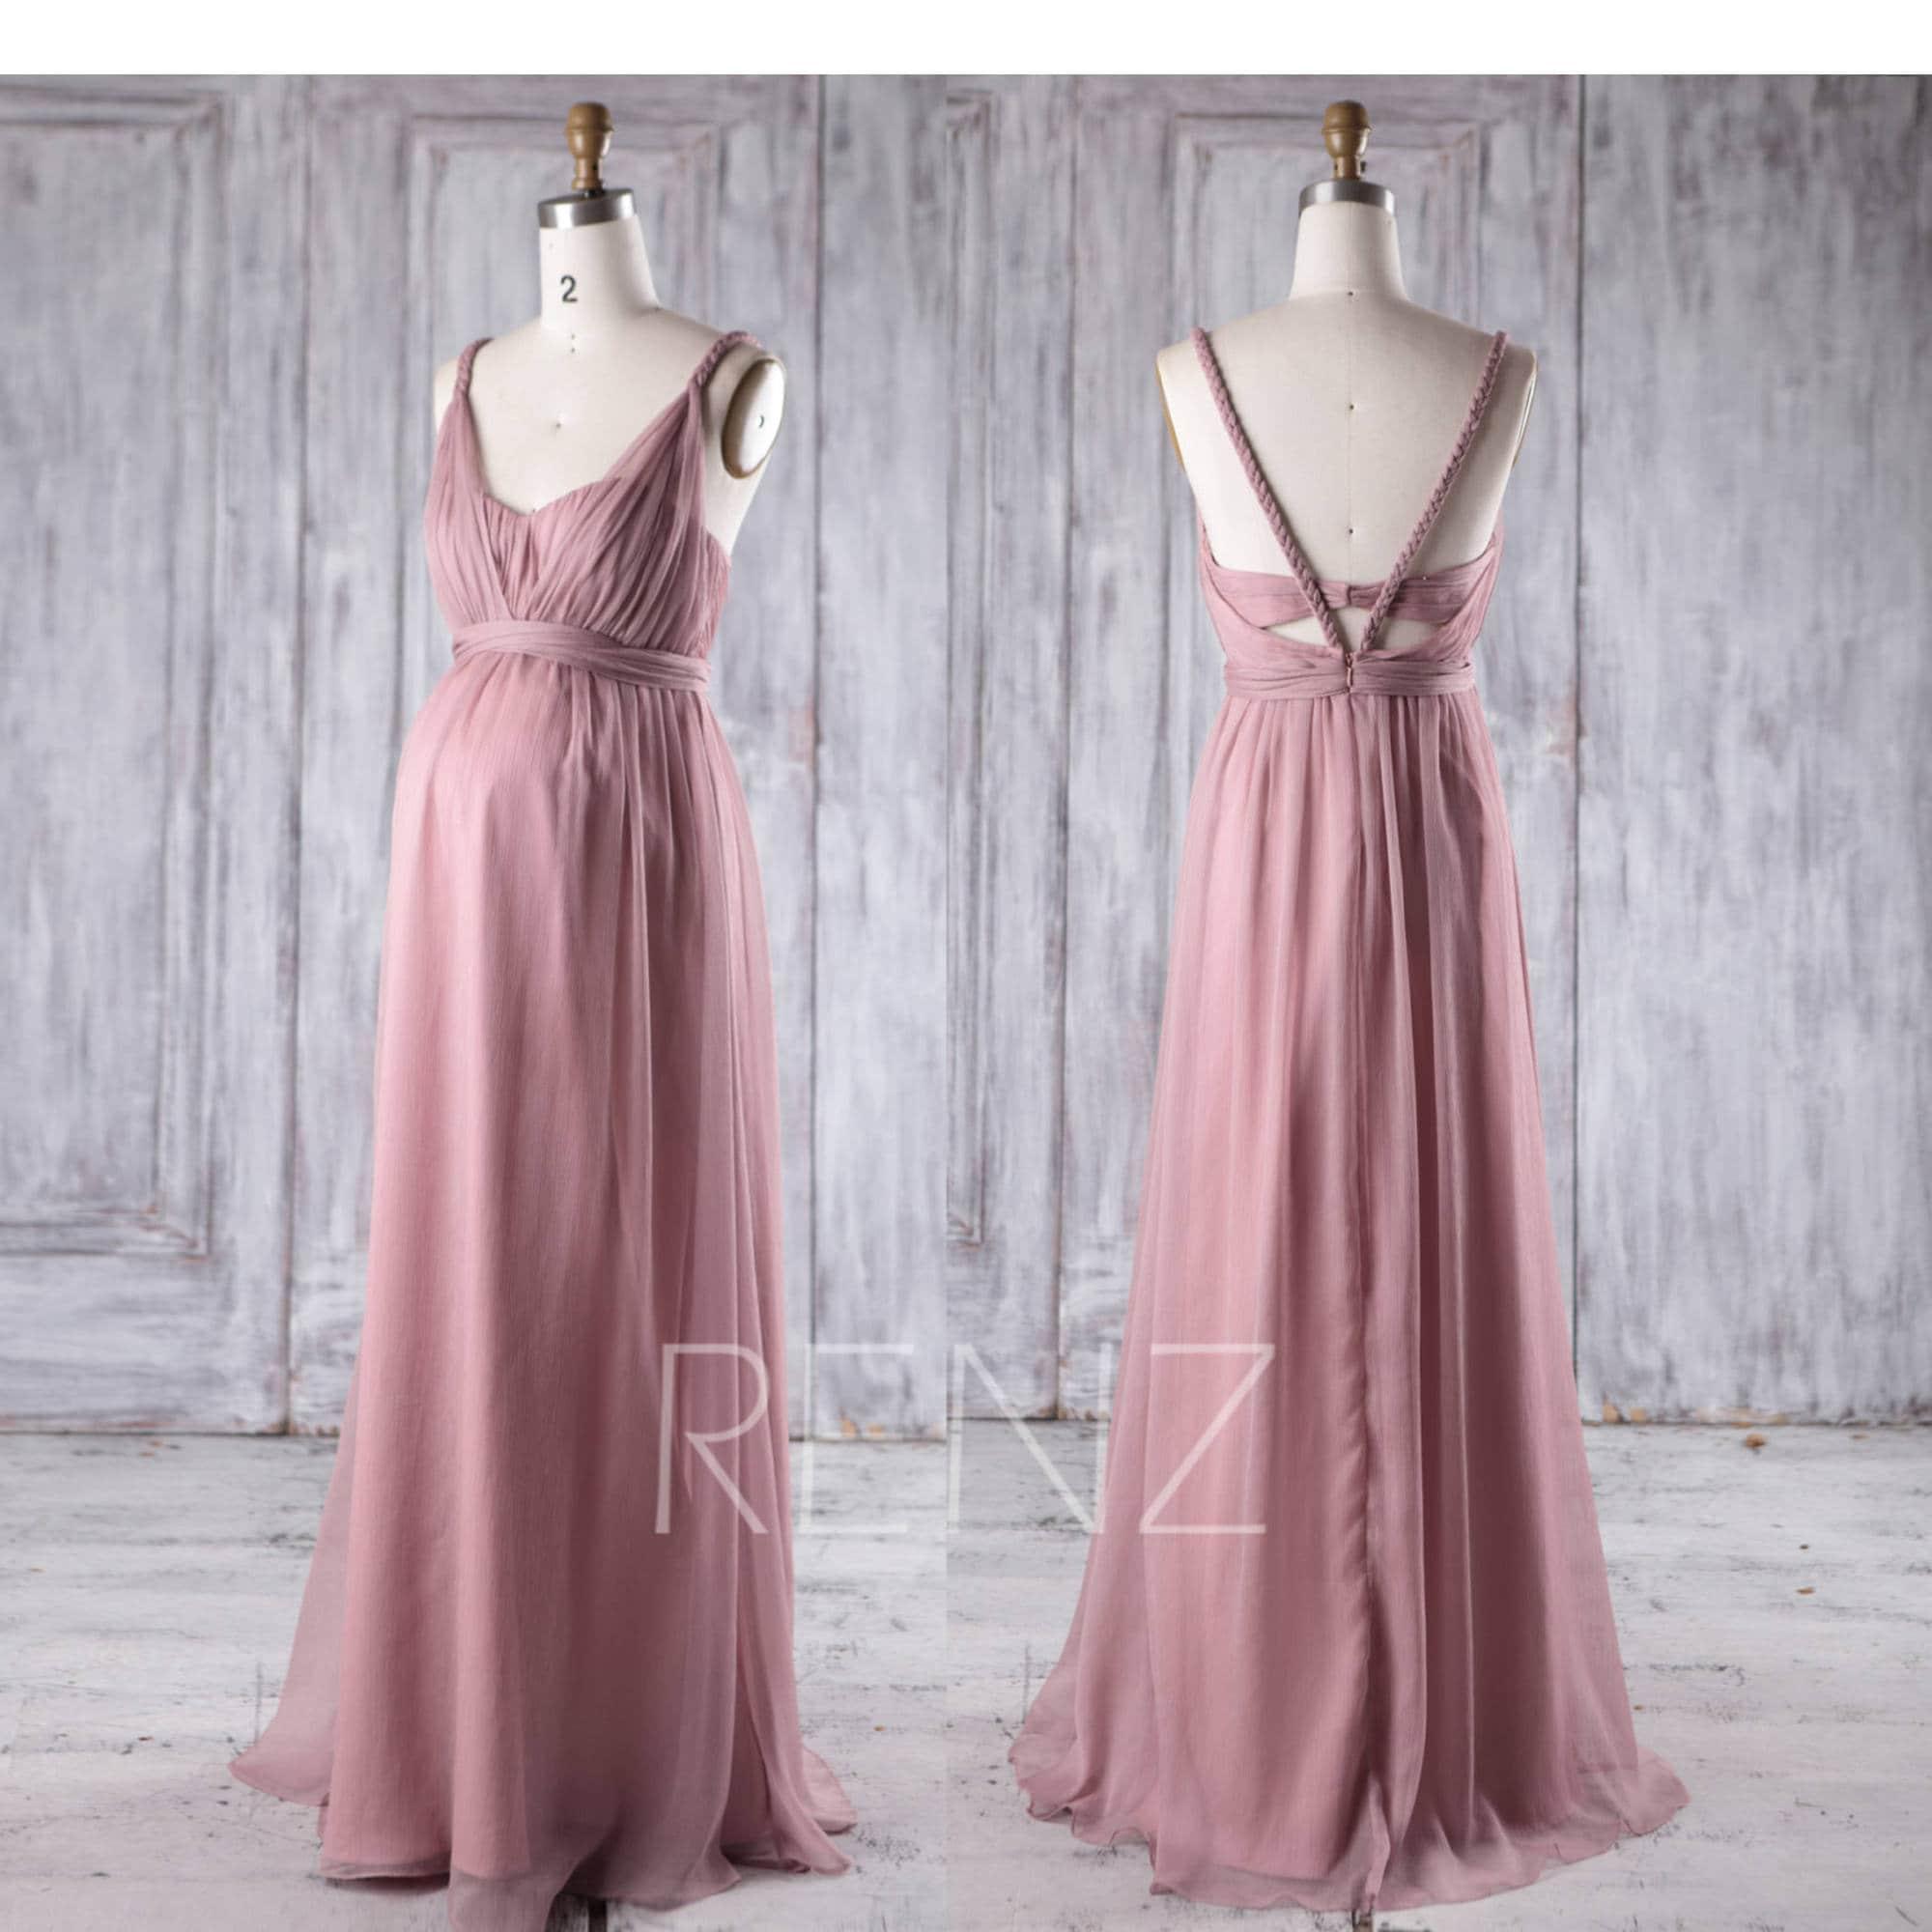 Maternity bridesmaid dress dusty rose chiffon wedding dress zoom ombrellifo Image collections